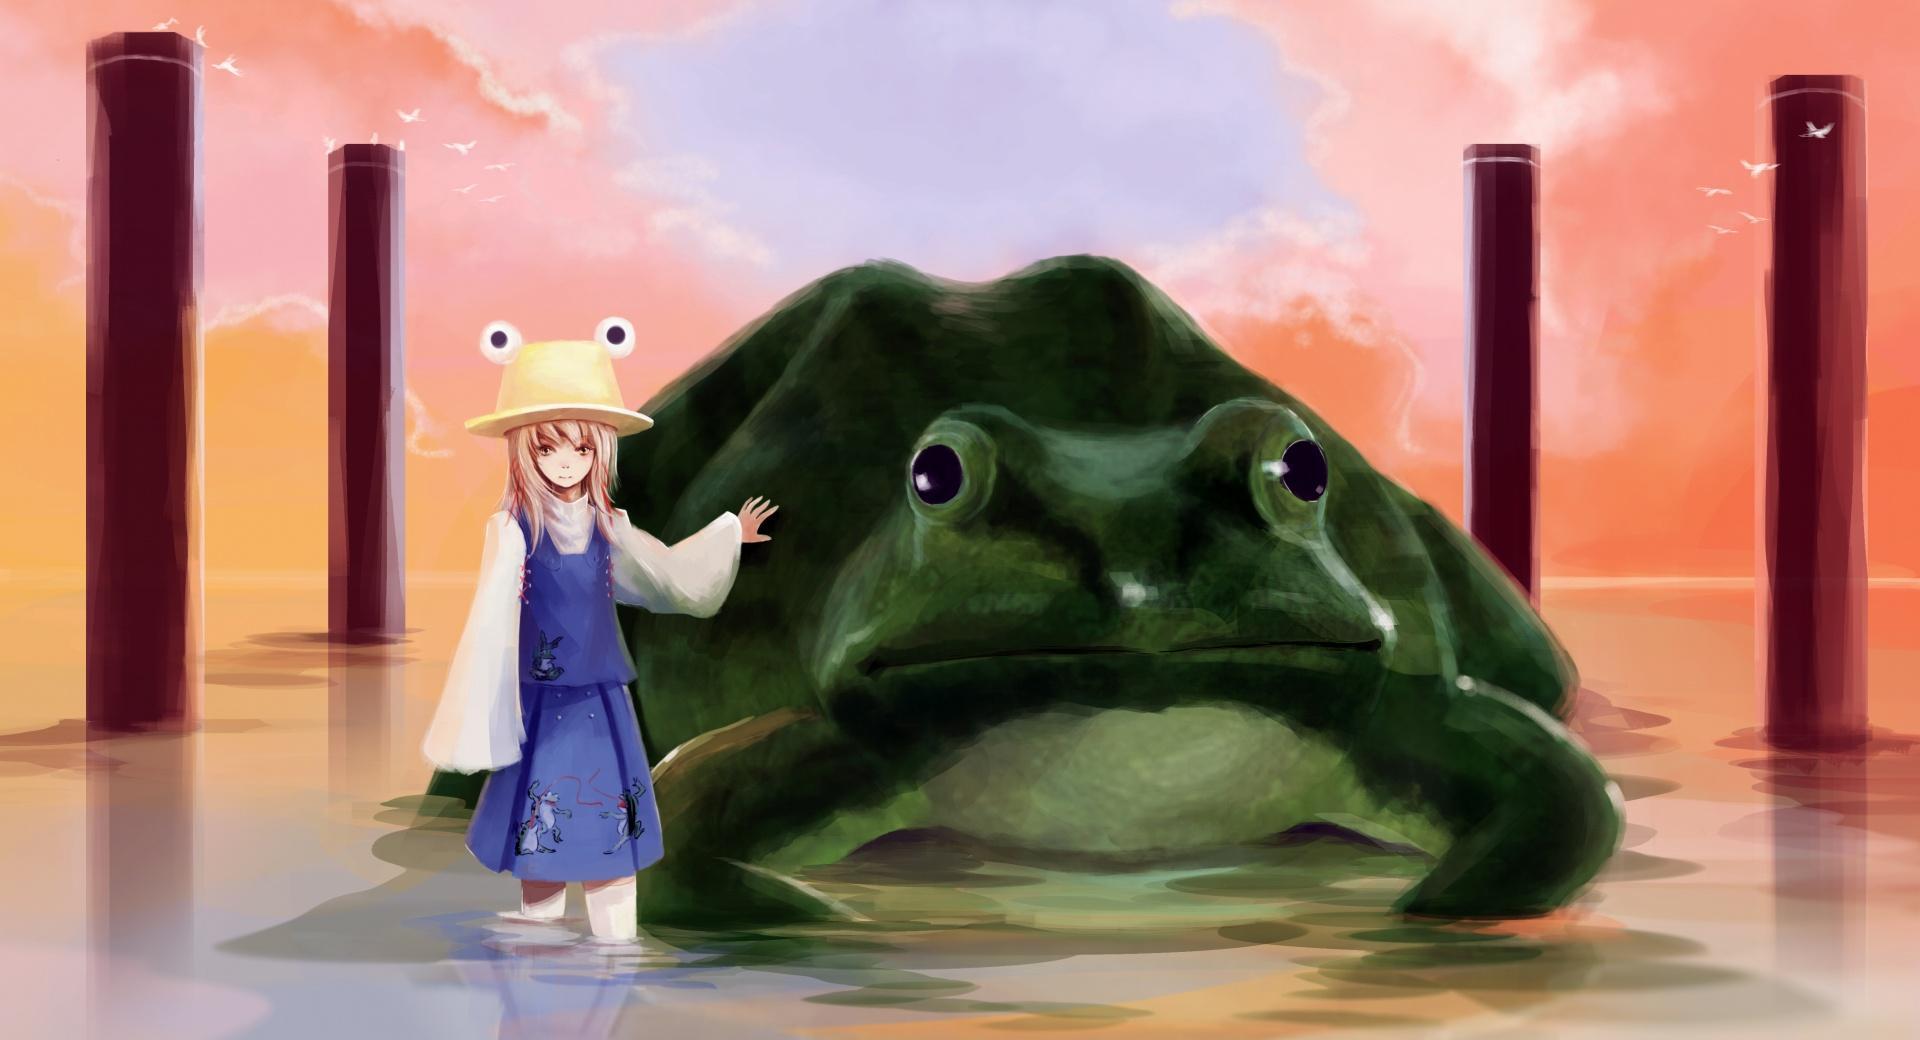 Girl And Big Frog wallpapers HD quality